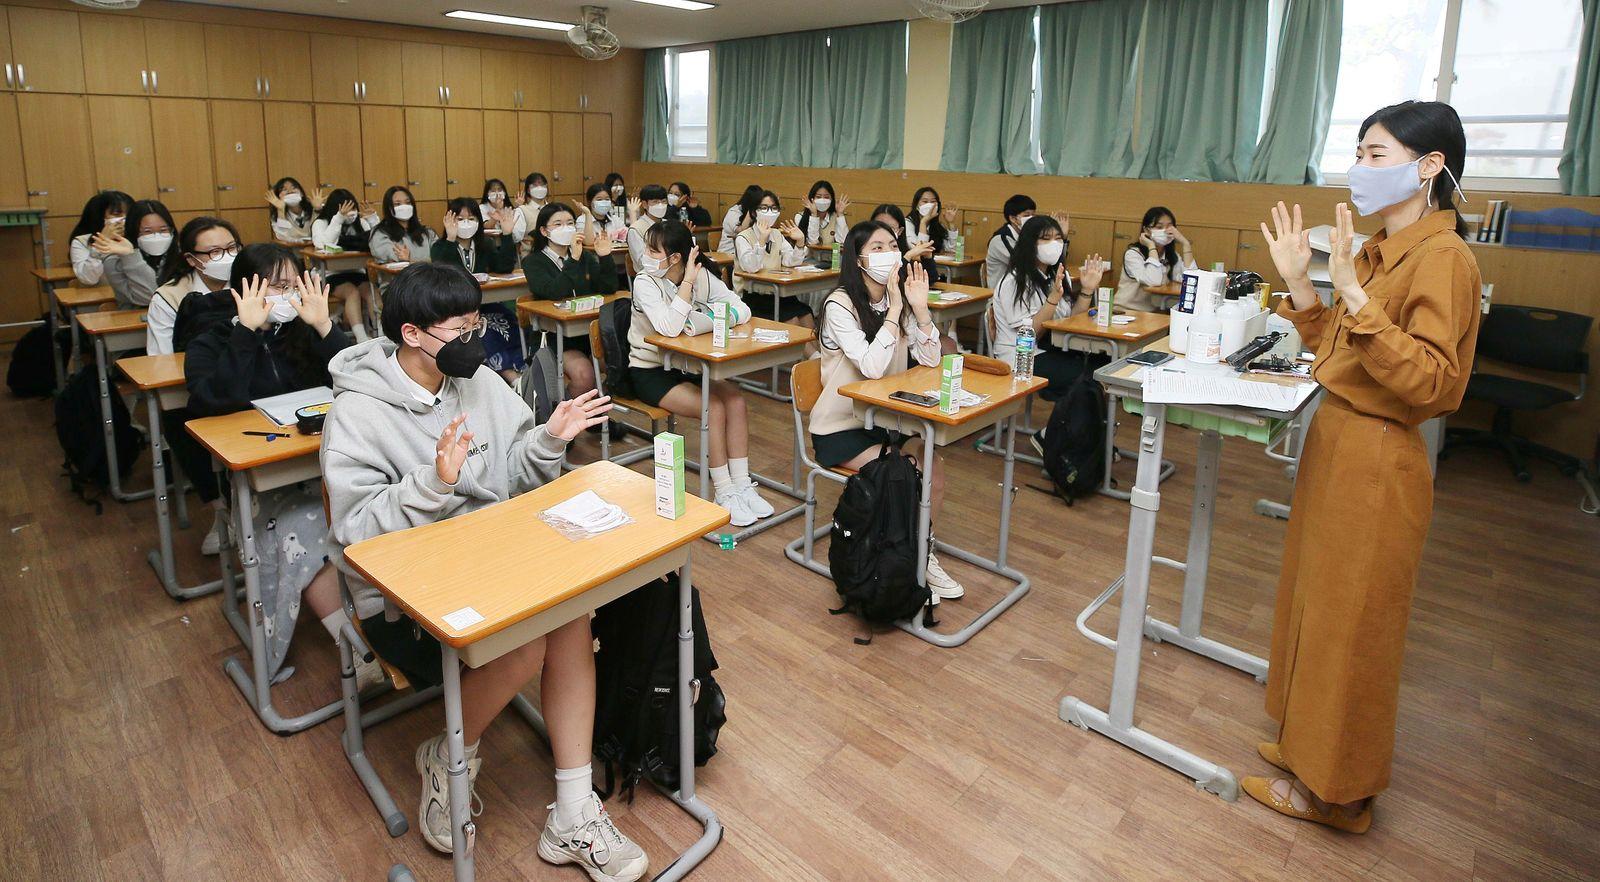 Schools reopen following the global outbreak of coronavirus disease (COVID-19), in South Korea